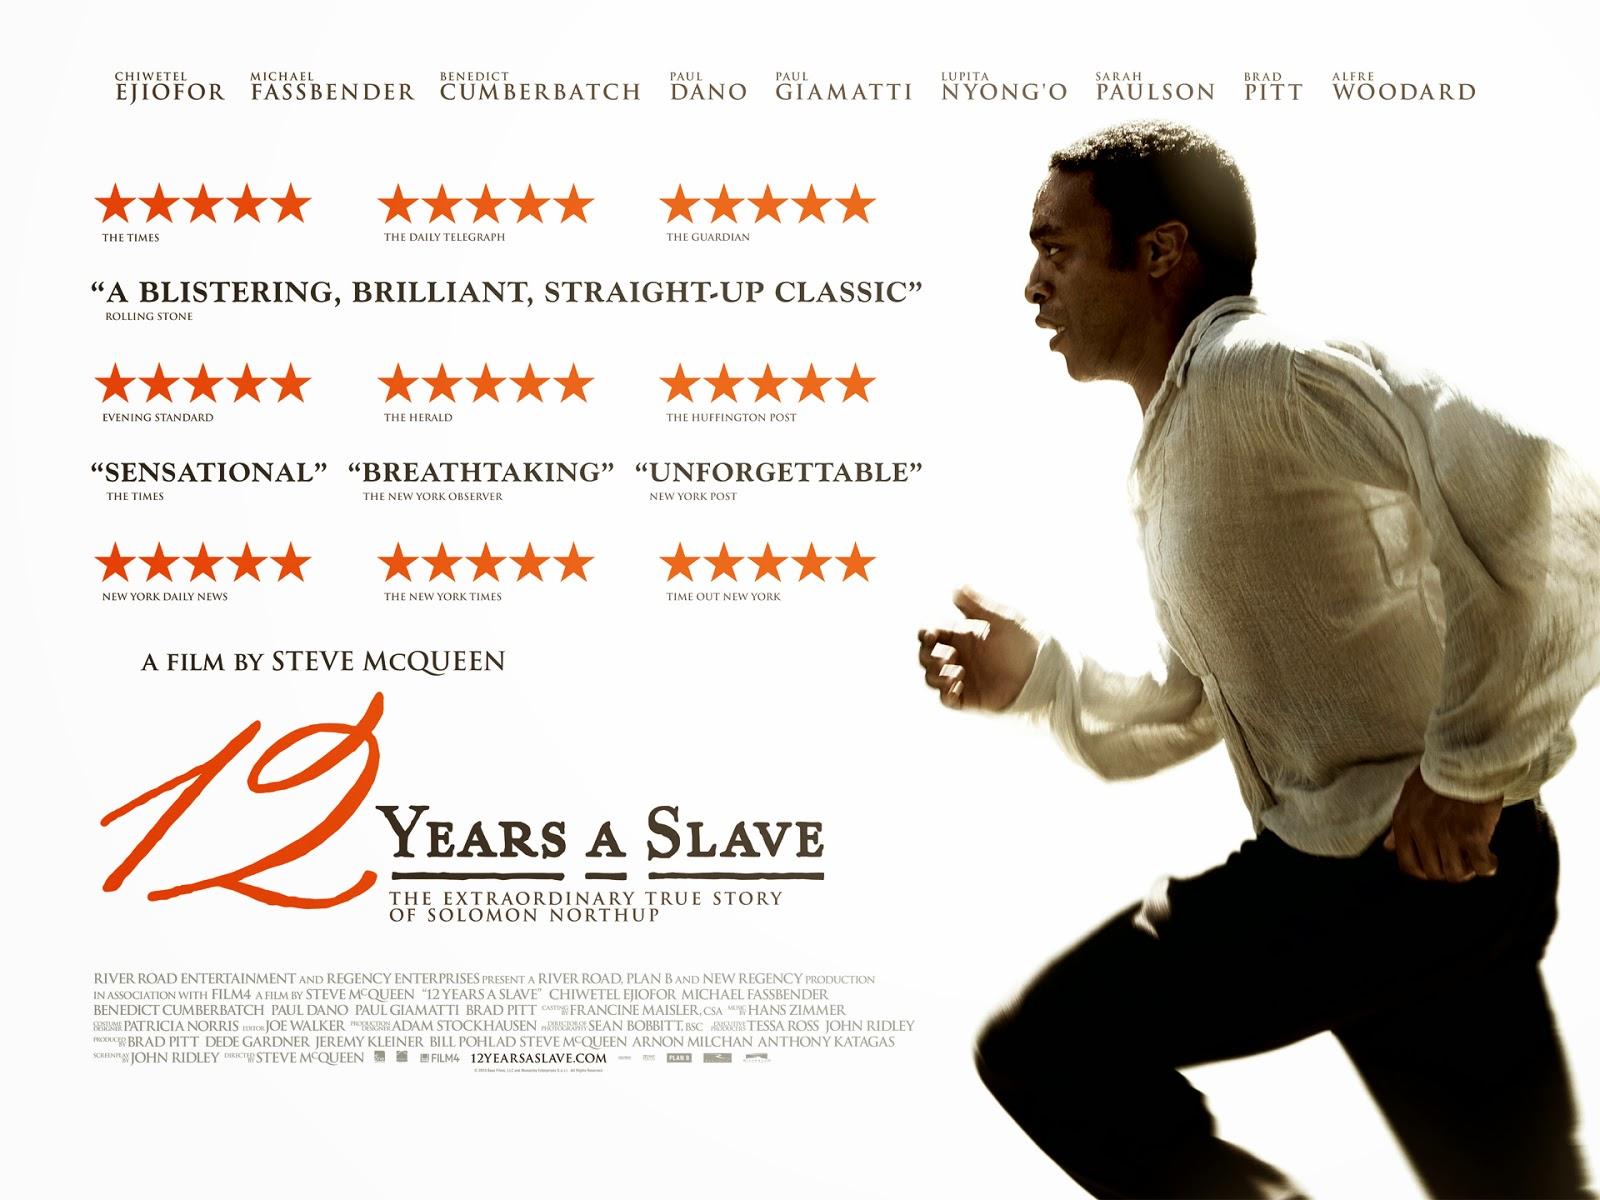 moja filmoteka blog filmowy 12 YEARS A SLAVE